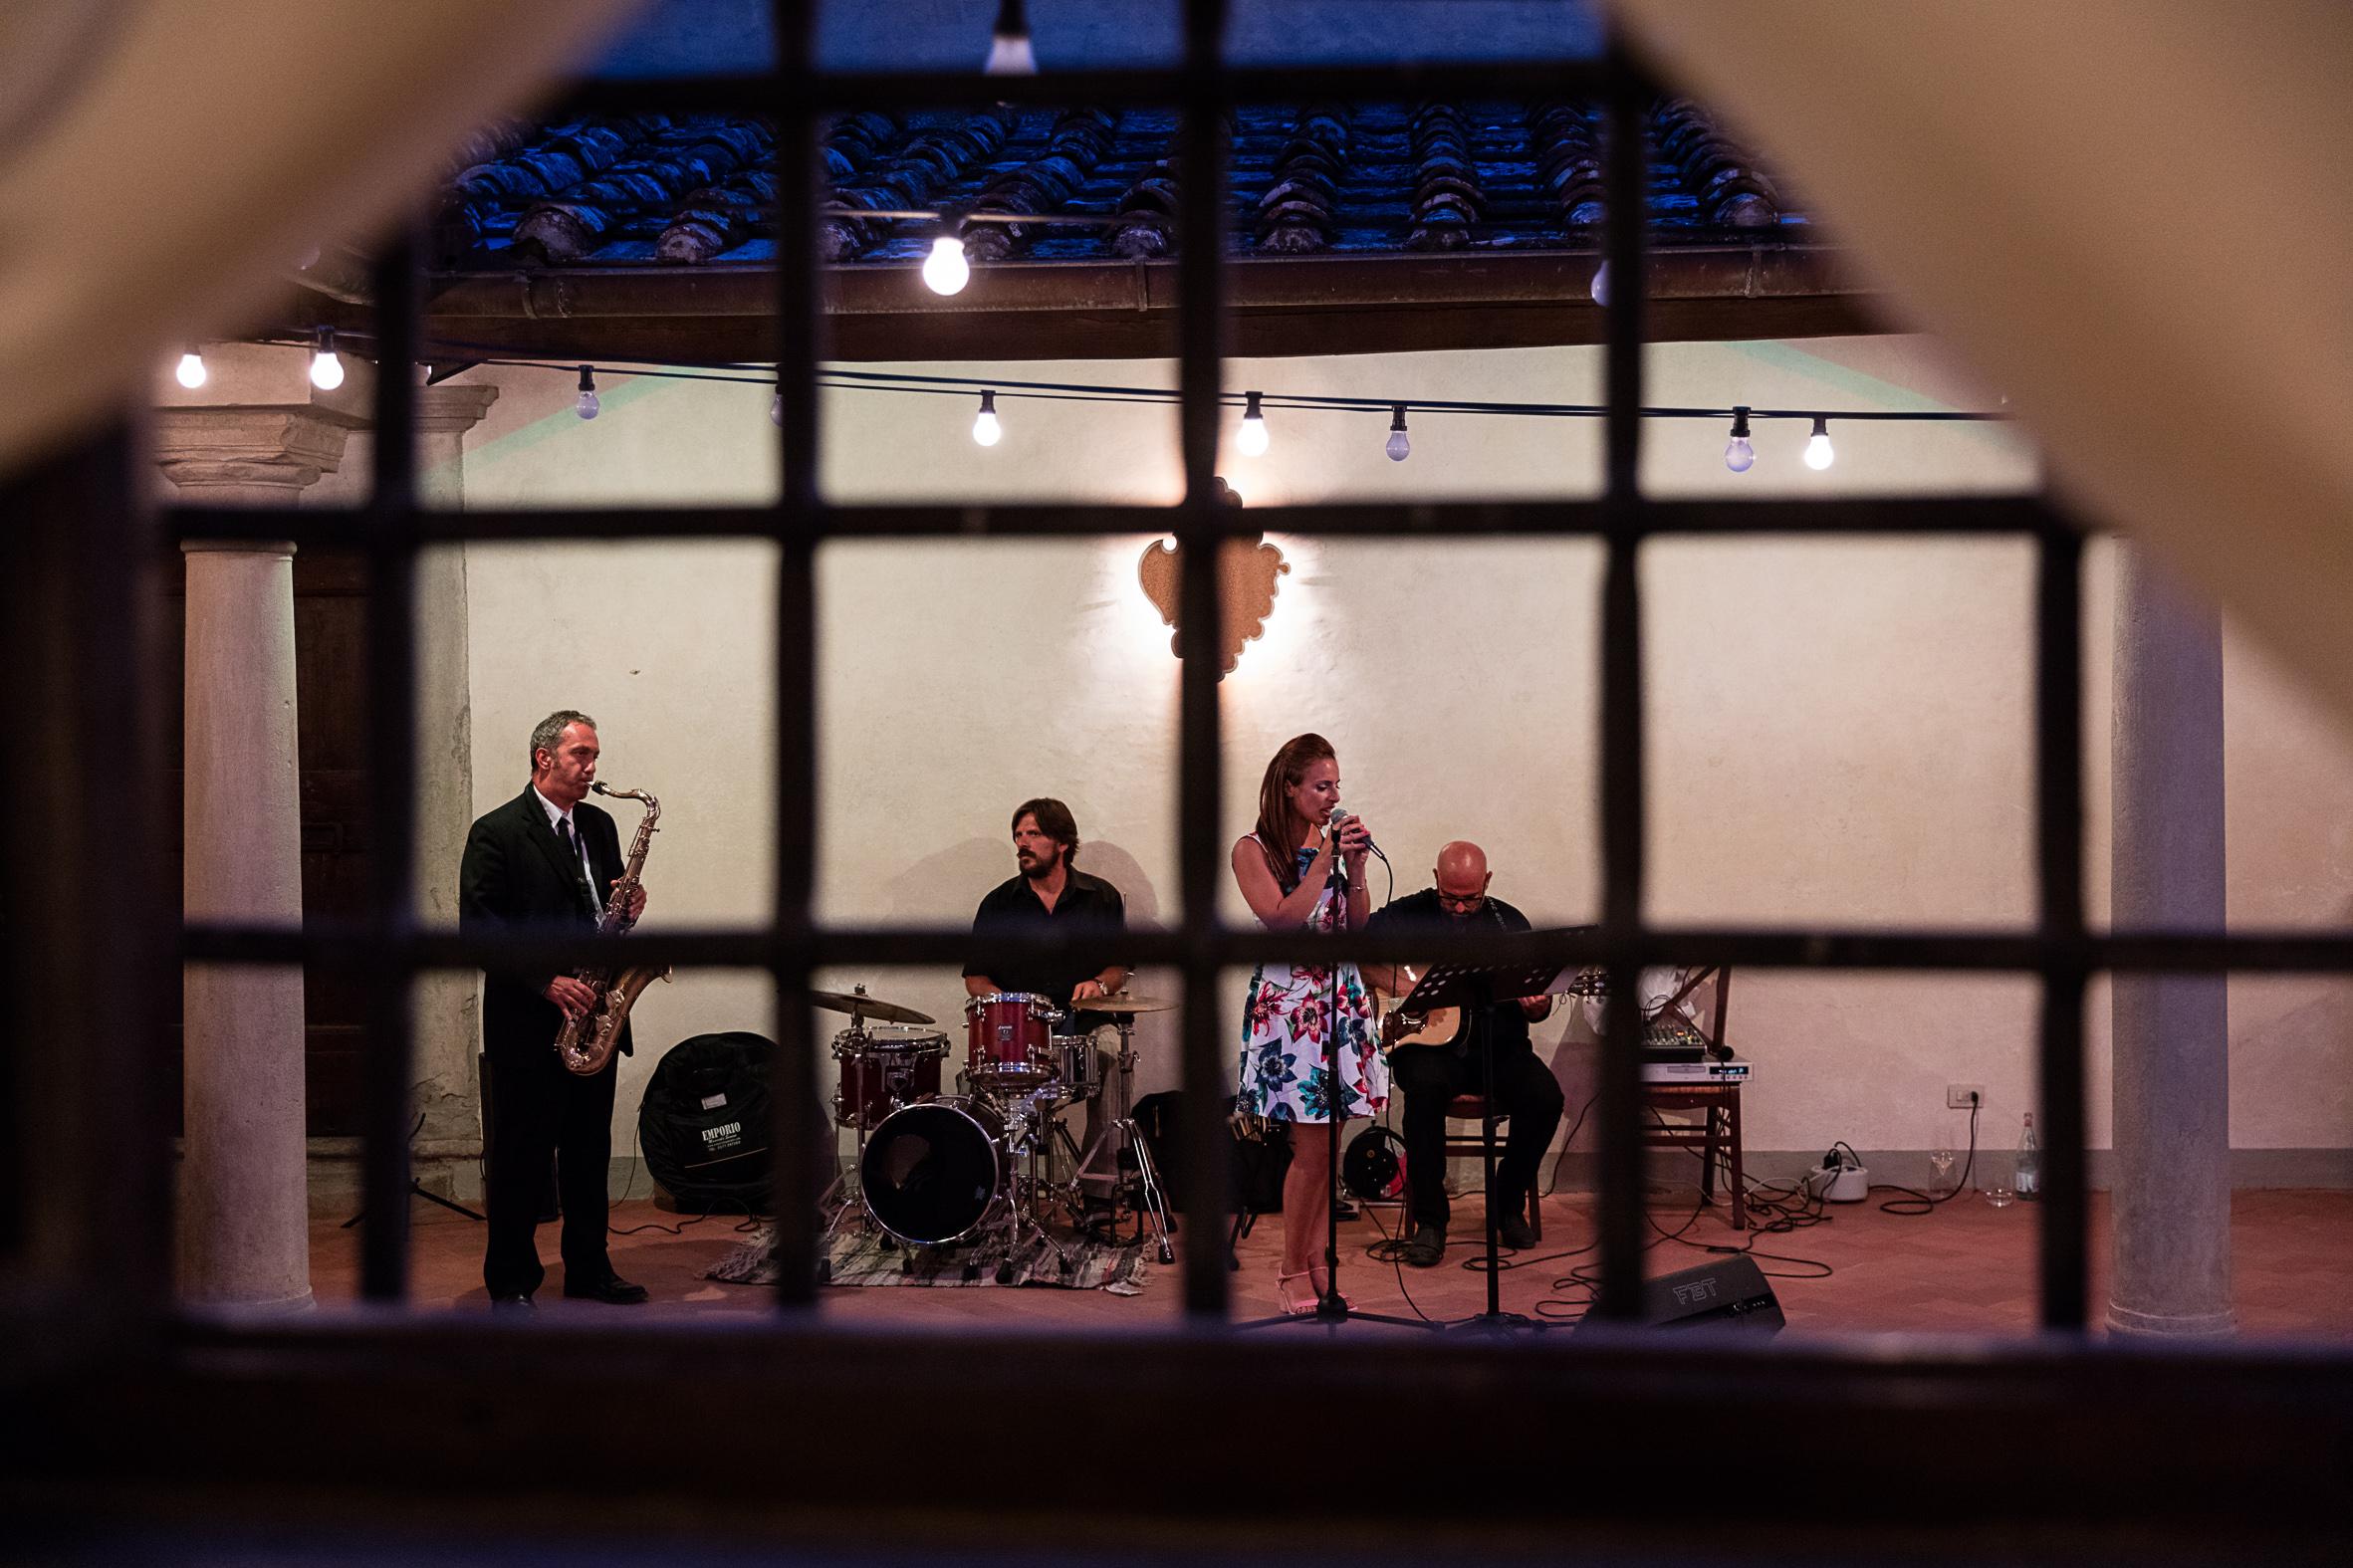 Hochzeit Andrea und Dario_Toskana 2017_258_a4.jpg